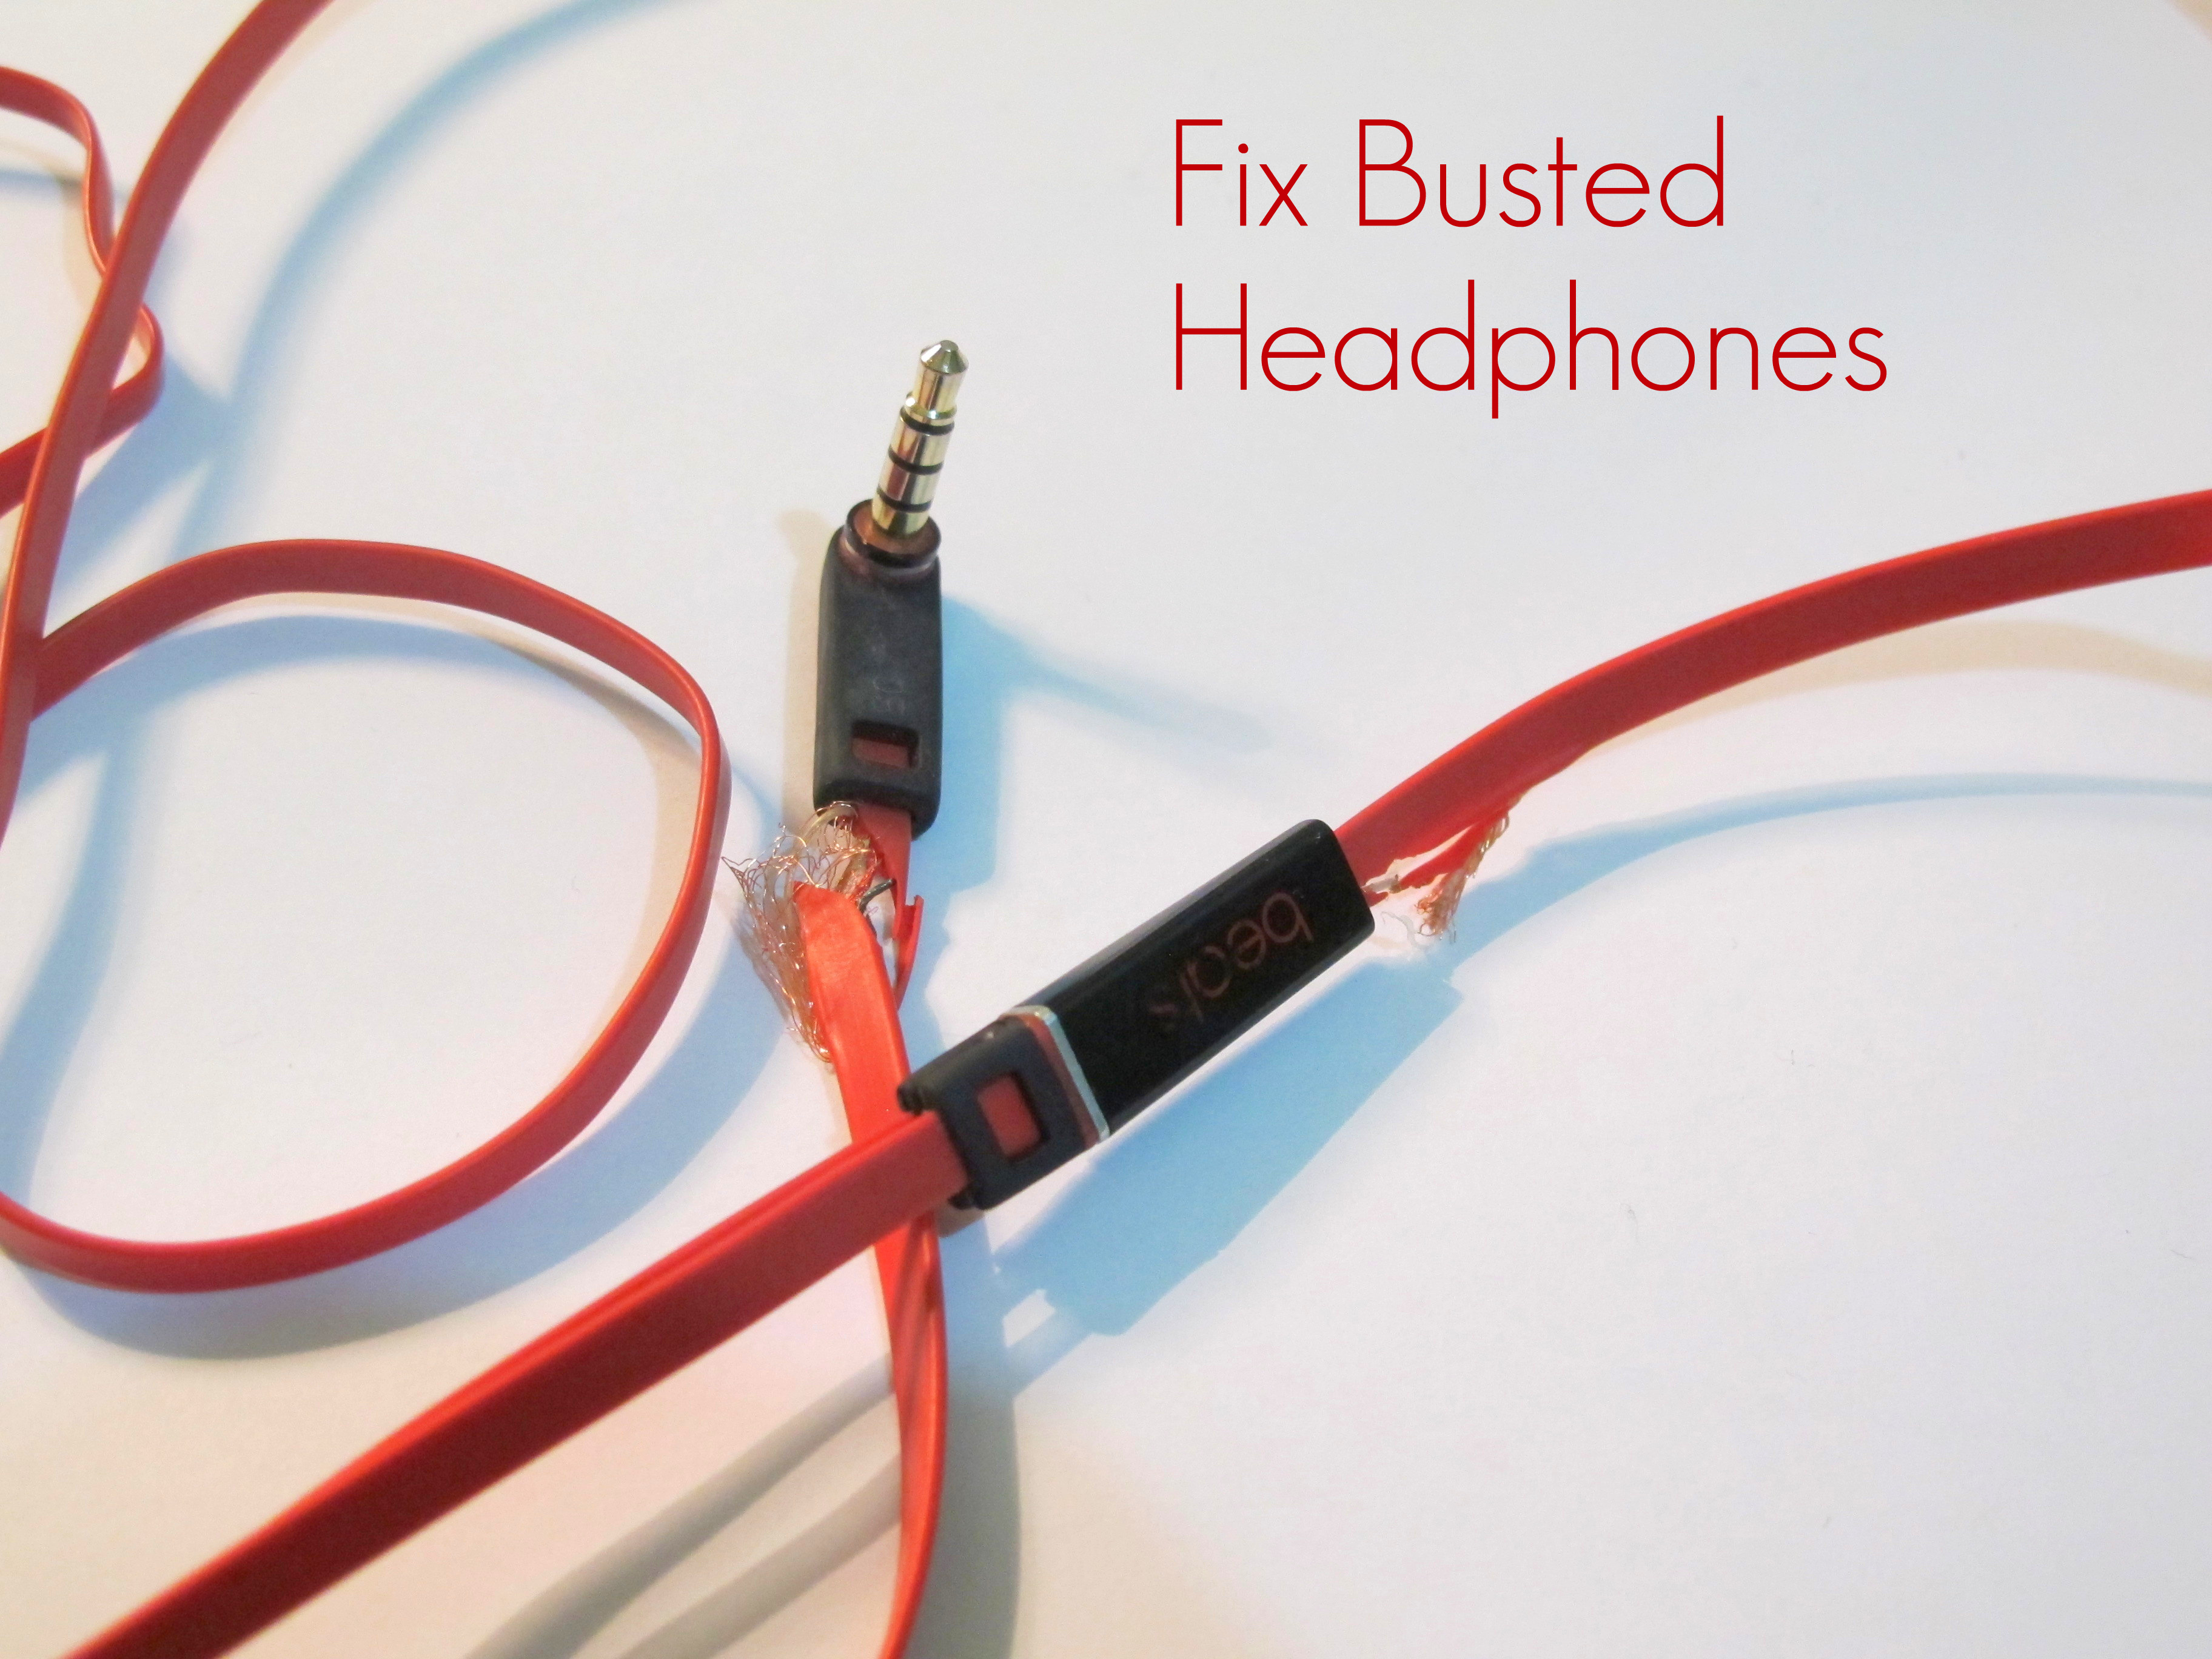 Beats Headphone Wire Diagram - Wiring 250v 15amp Schematic -  jaguars.yenpancane.jeanjaures37.fr | Beats Headphone Wire Diagram |  | Wiring Diagram Resource